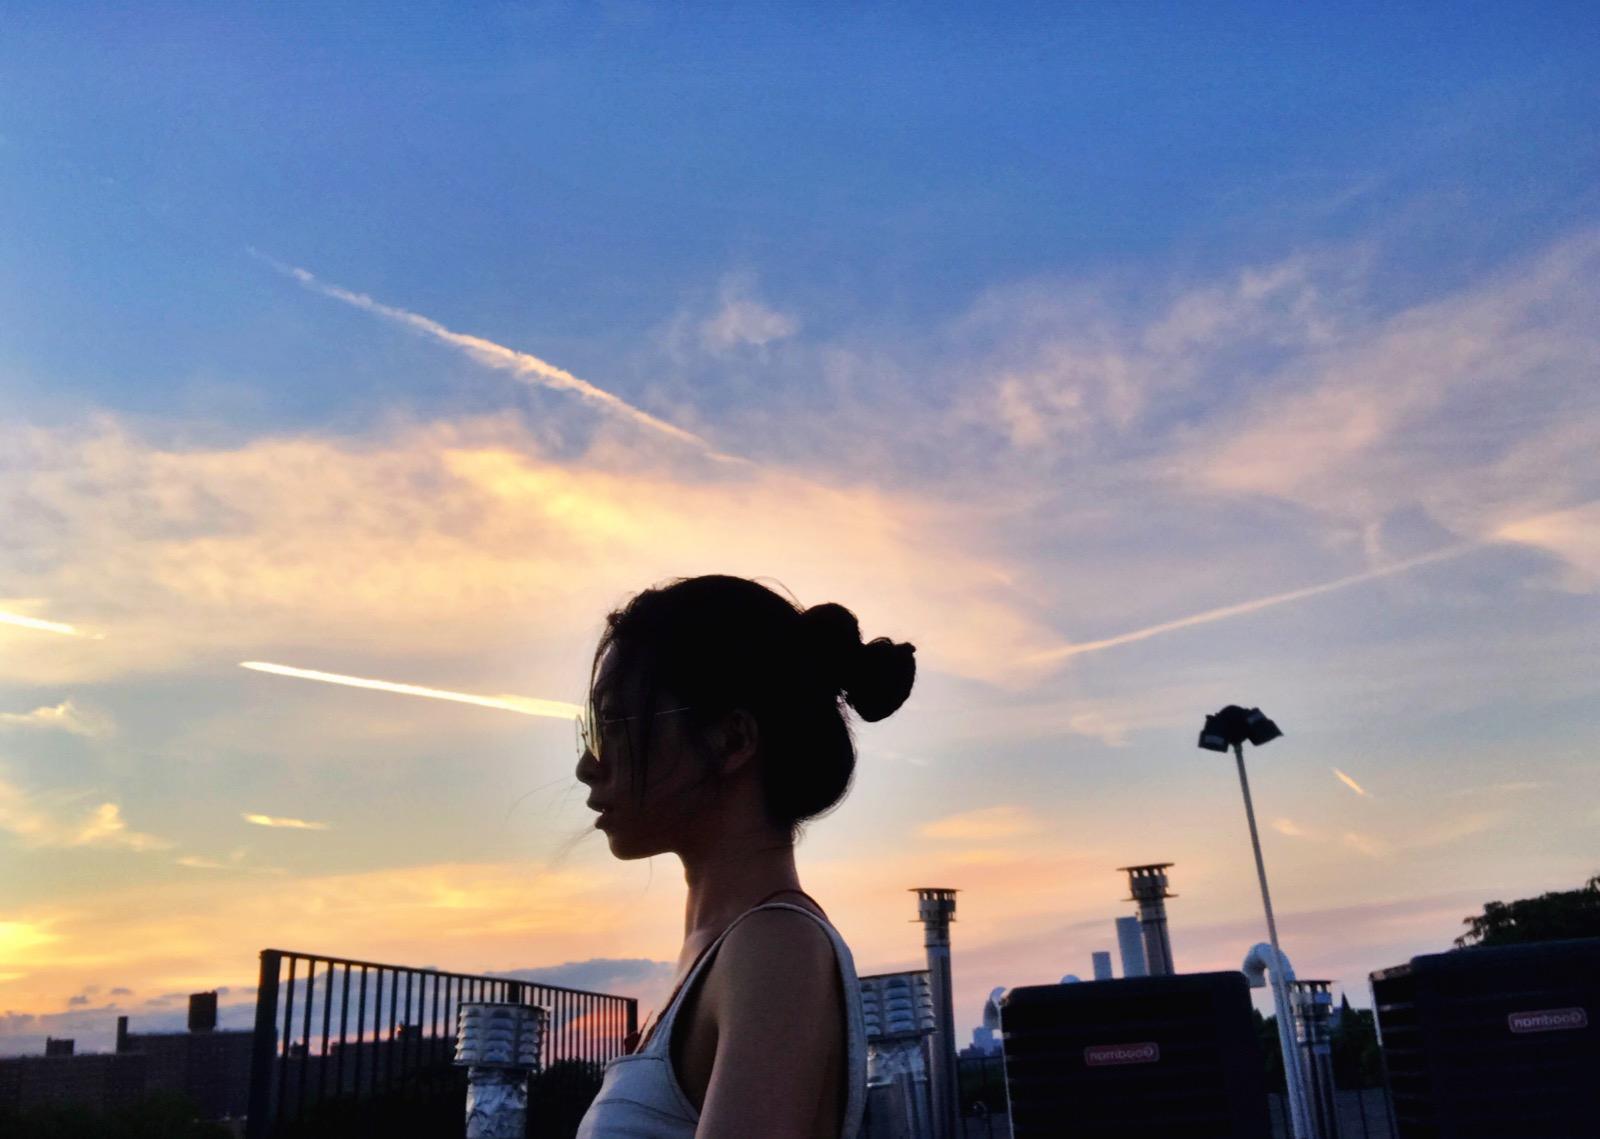 Watching the Moon,Bedstuy,Brooklyn,NY 2016